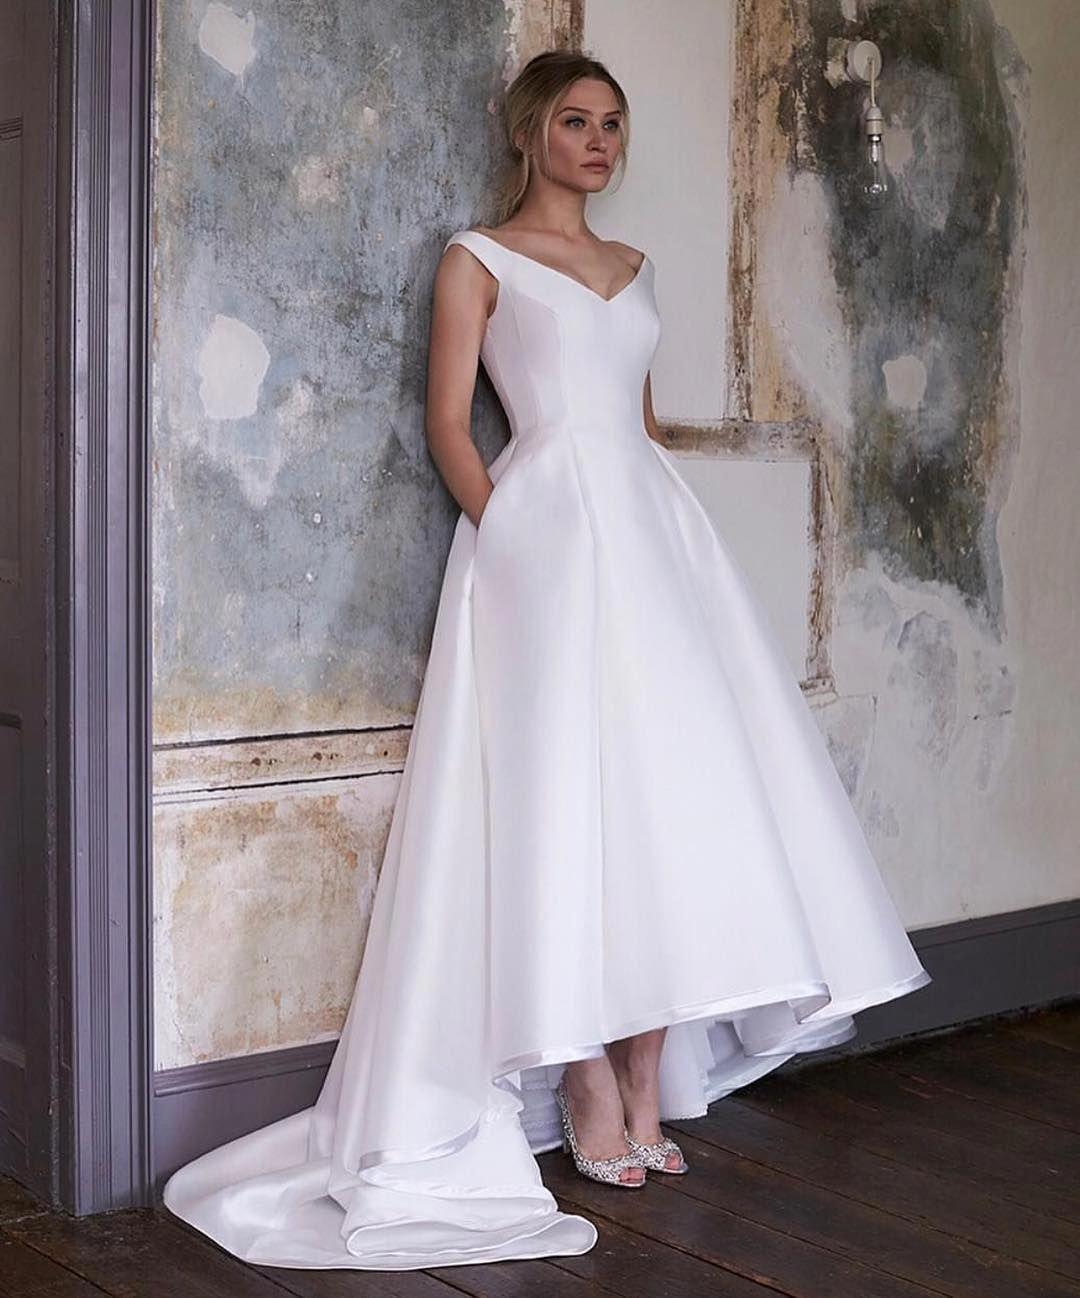 Best wedding dresses for 50 year olds  incrediblebeddingideas  Incredible Bedroom Ideas  Pinterest